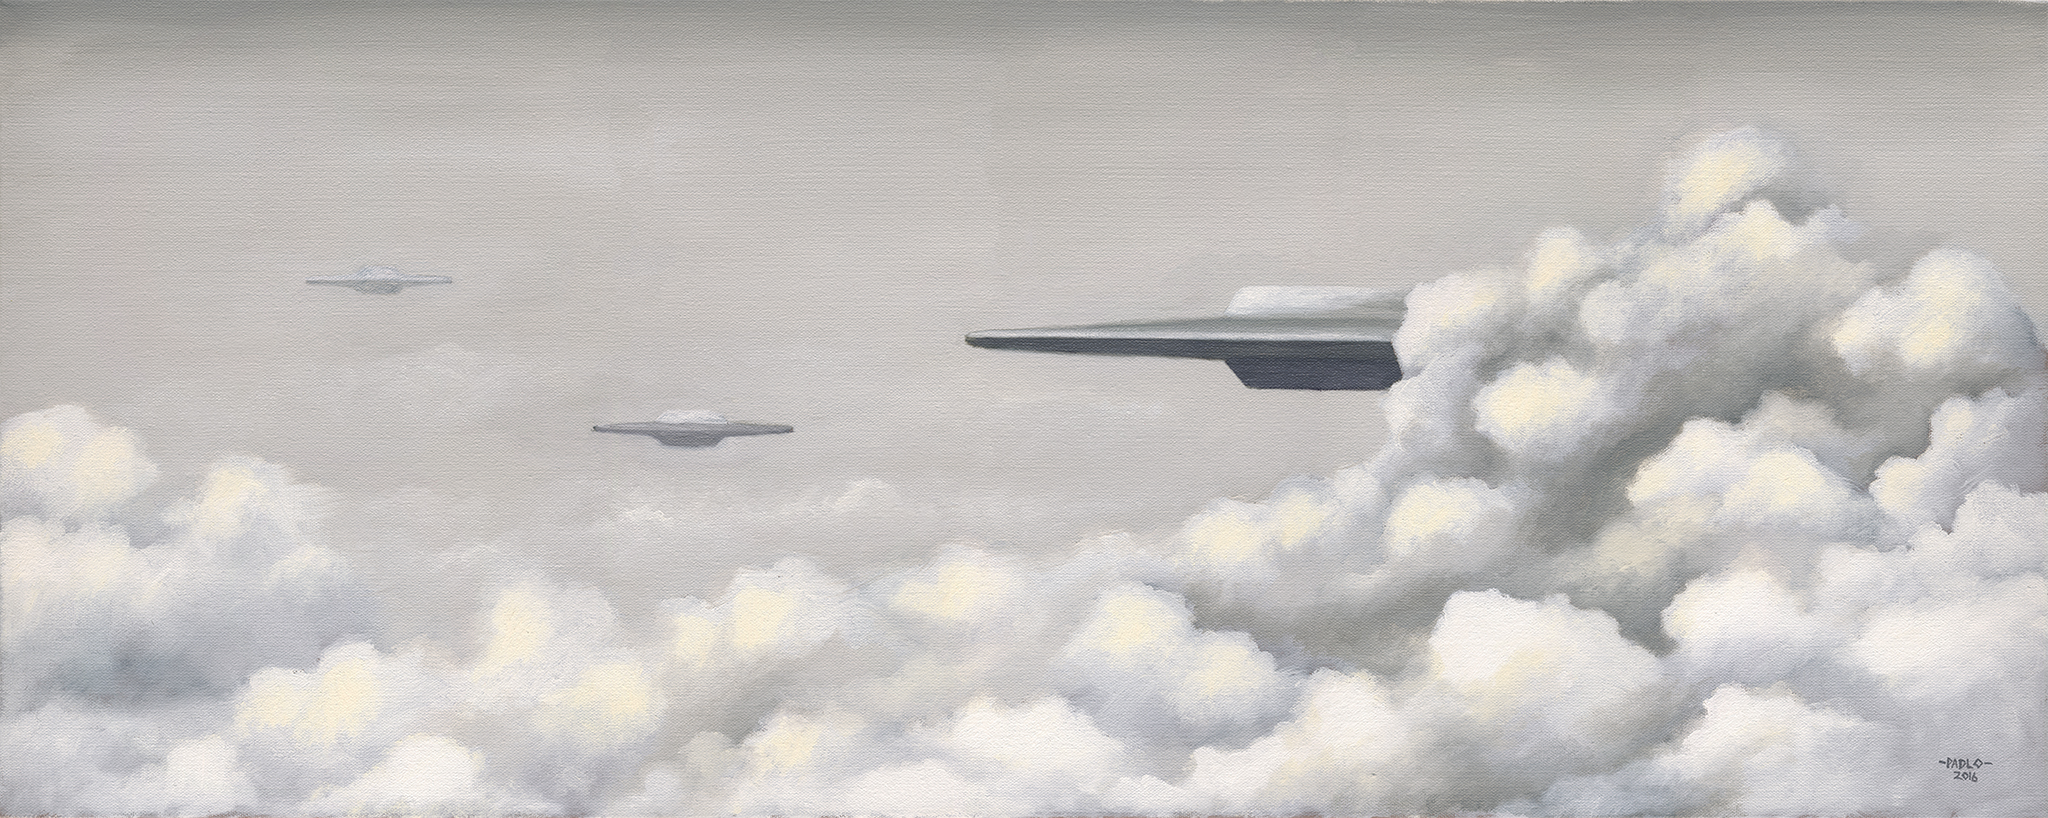 UFO Sighting 43